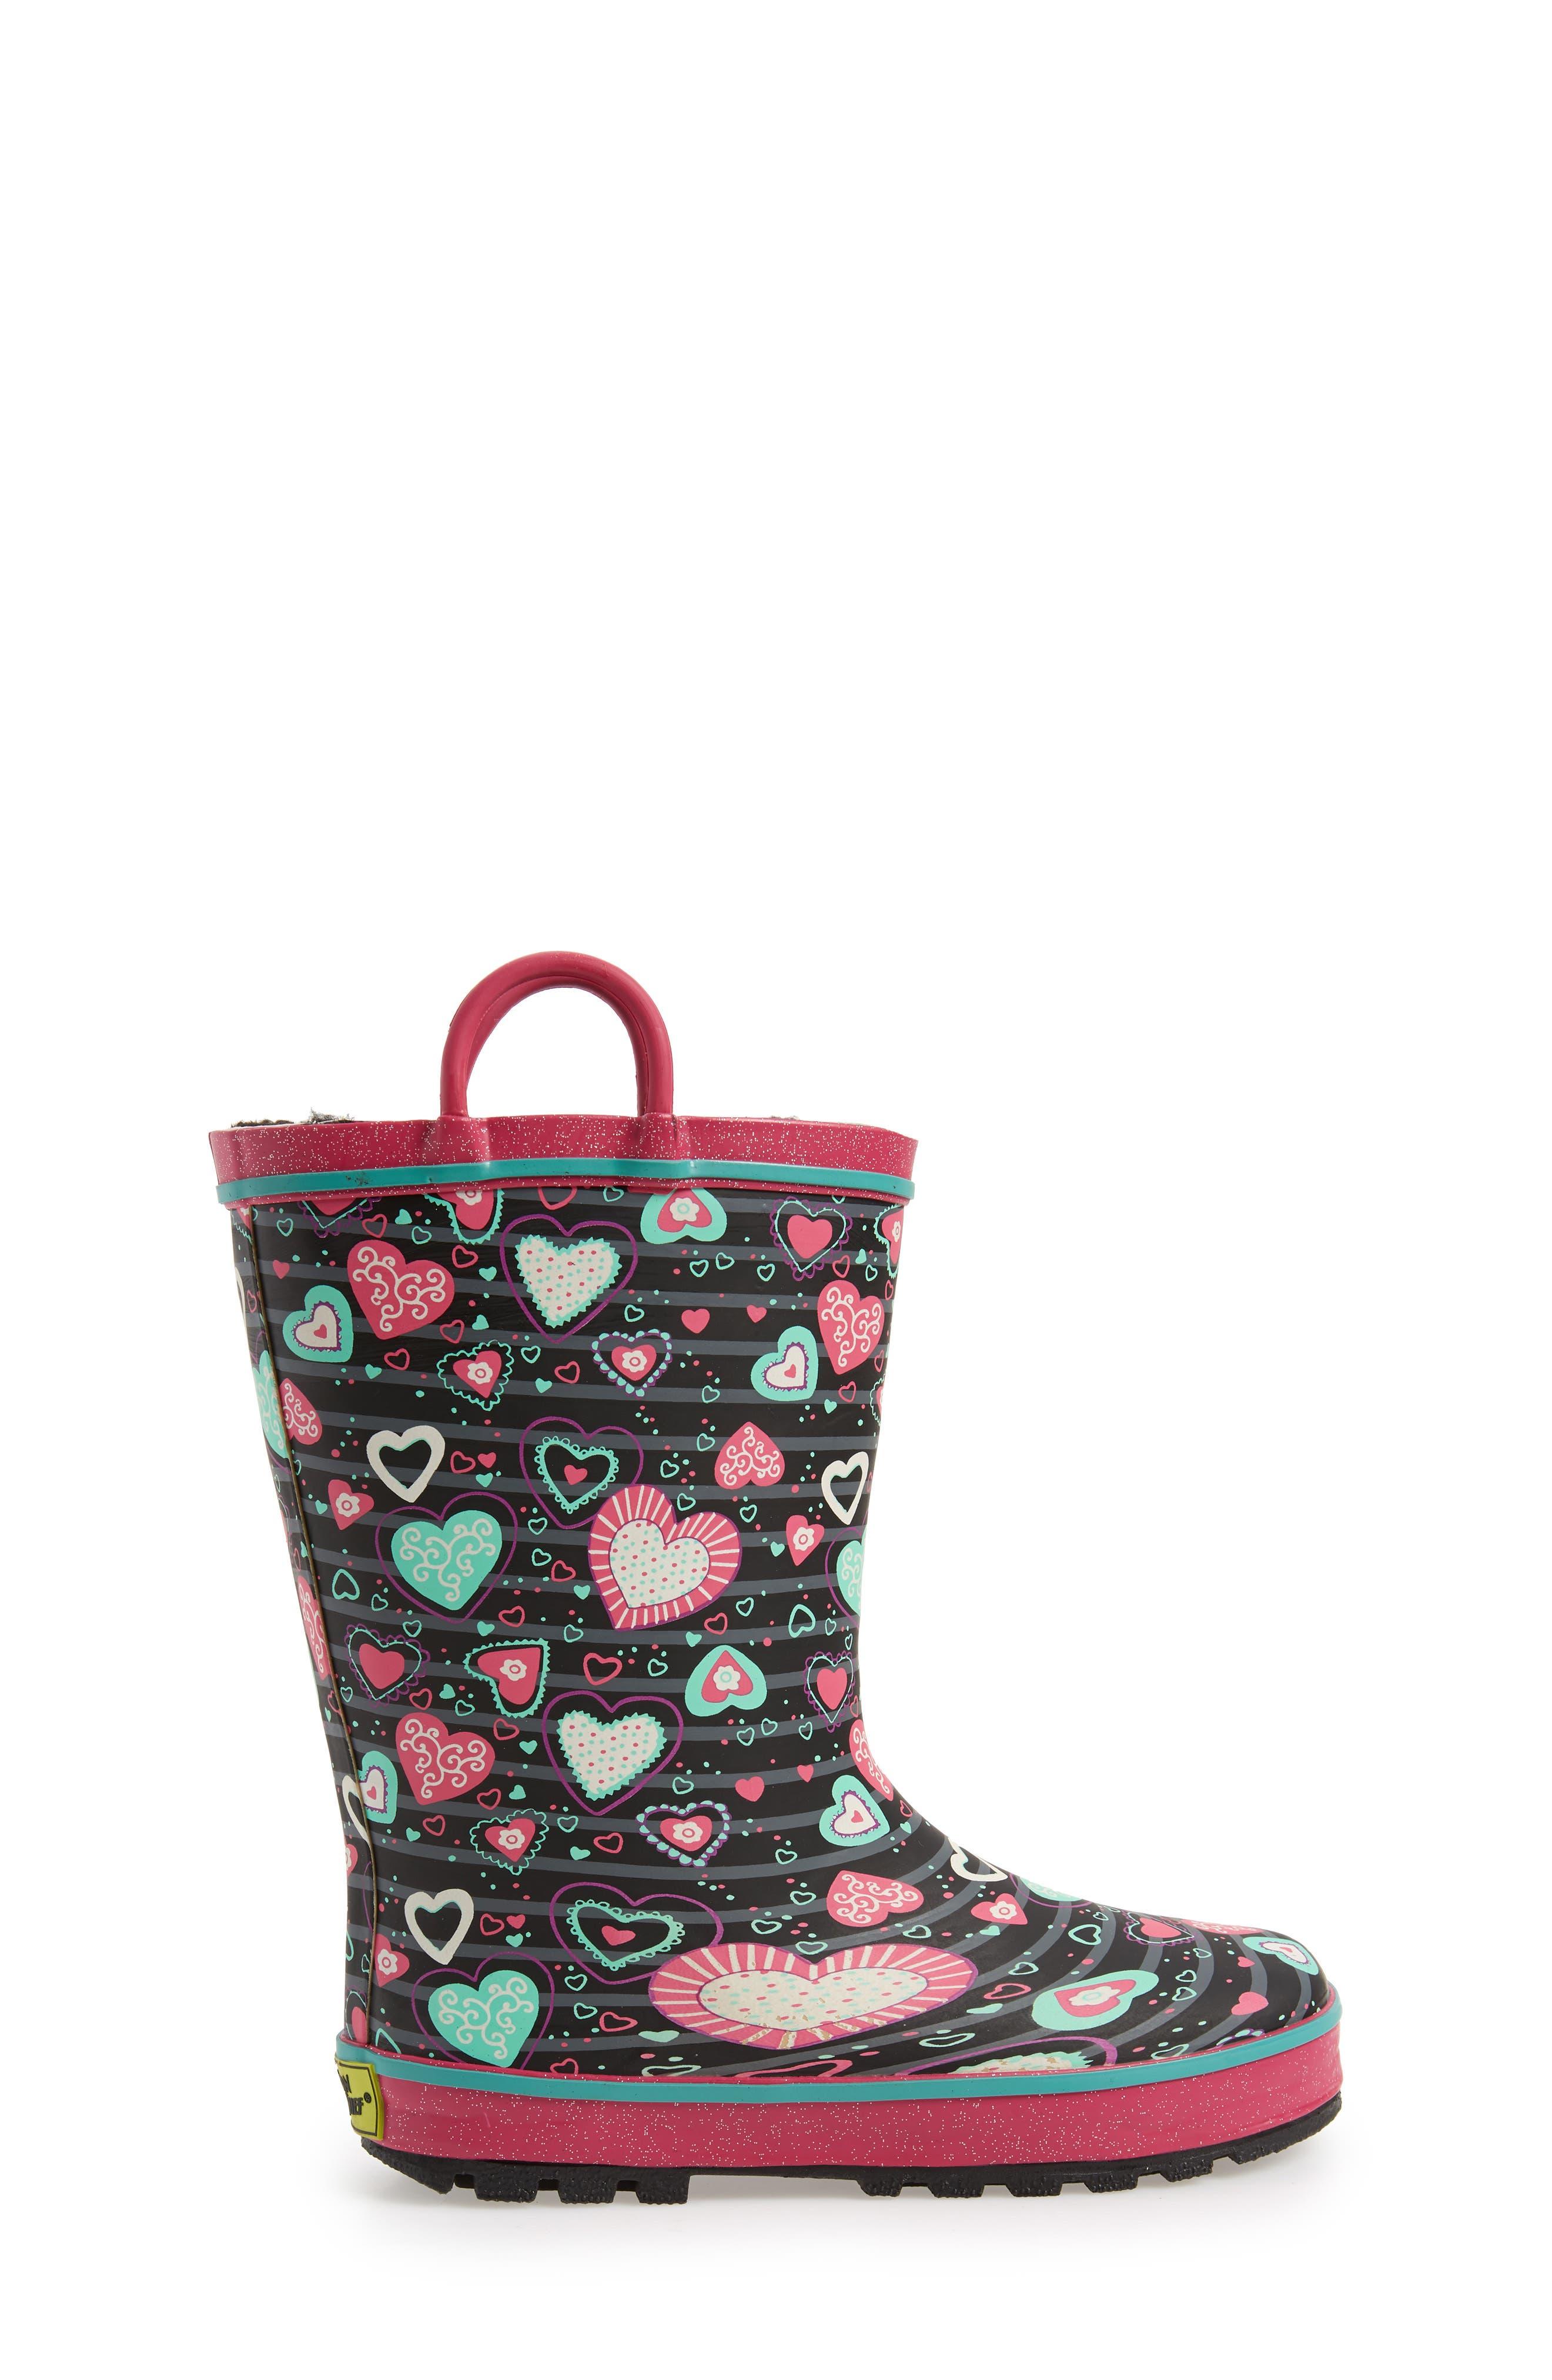 Neon Hearts Glitter Trim Waterproof Rain Boot,                             Alternate thumbnail 3, color,                             MULTI